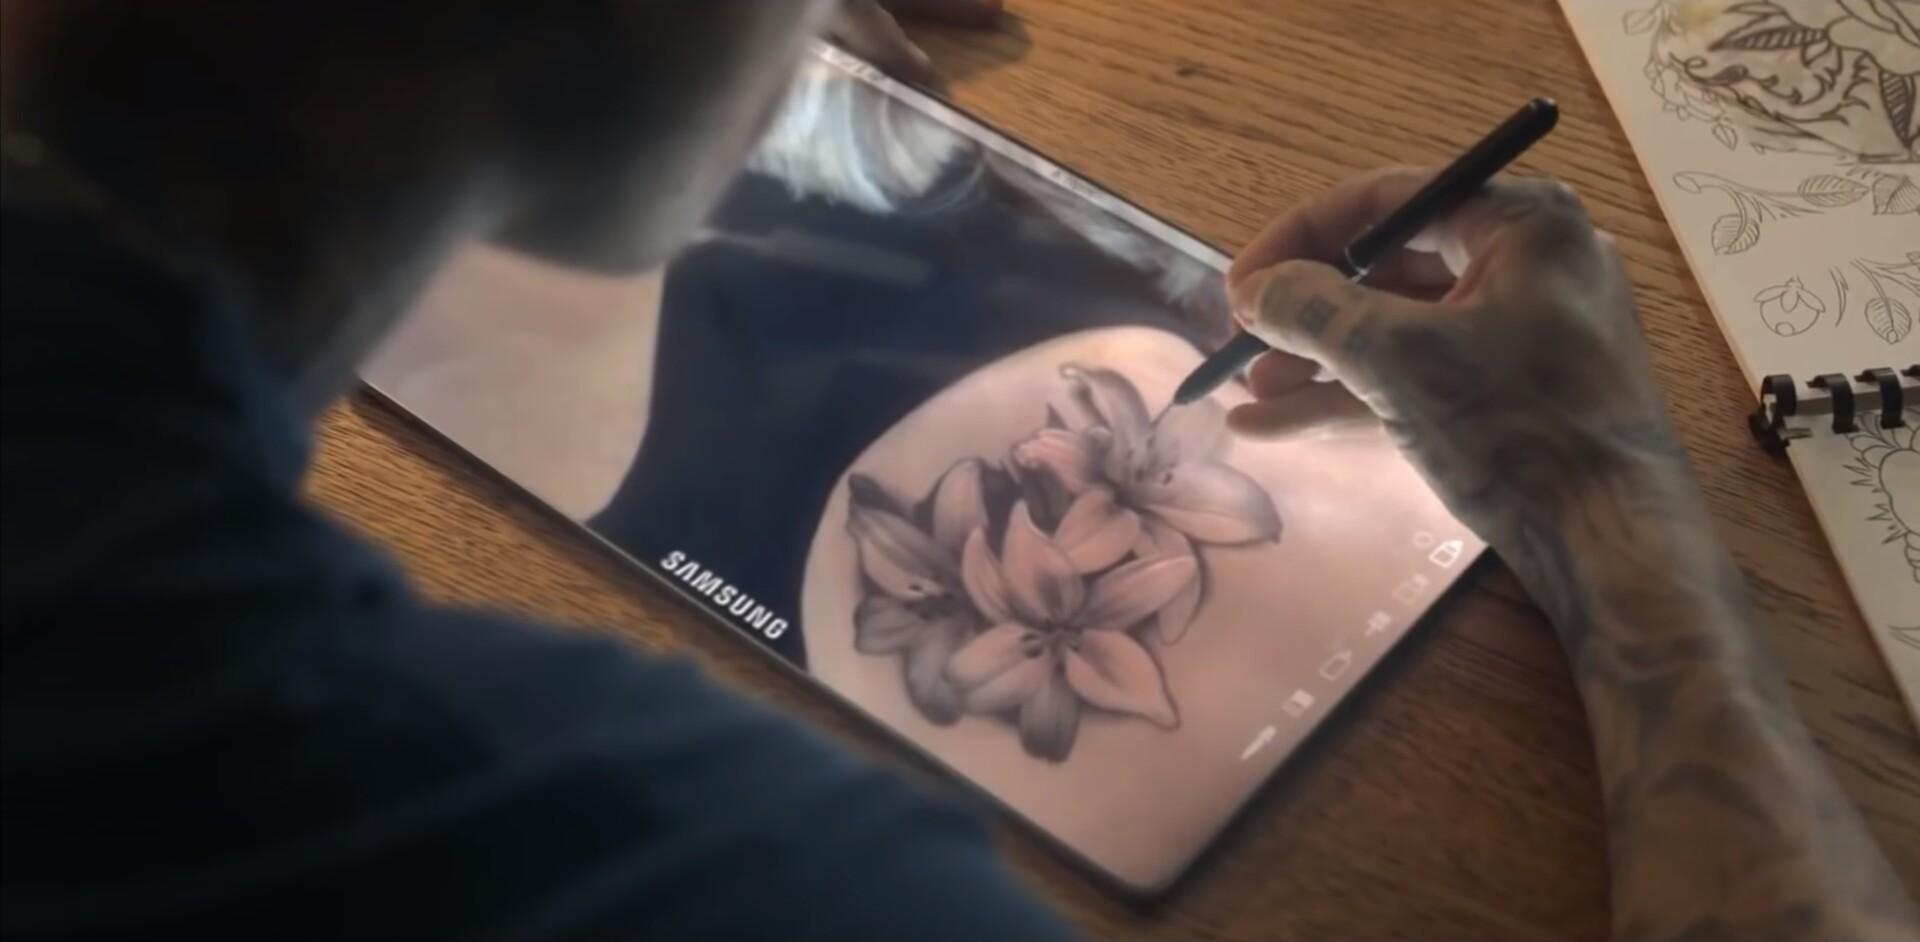 A tattoo artist drawing on a bezel-less tablet